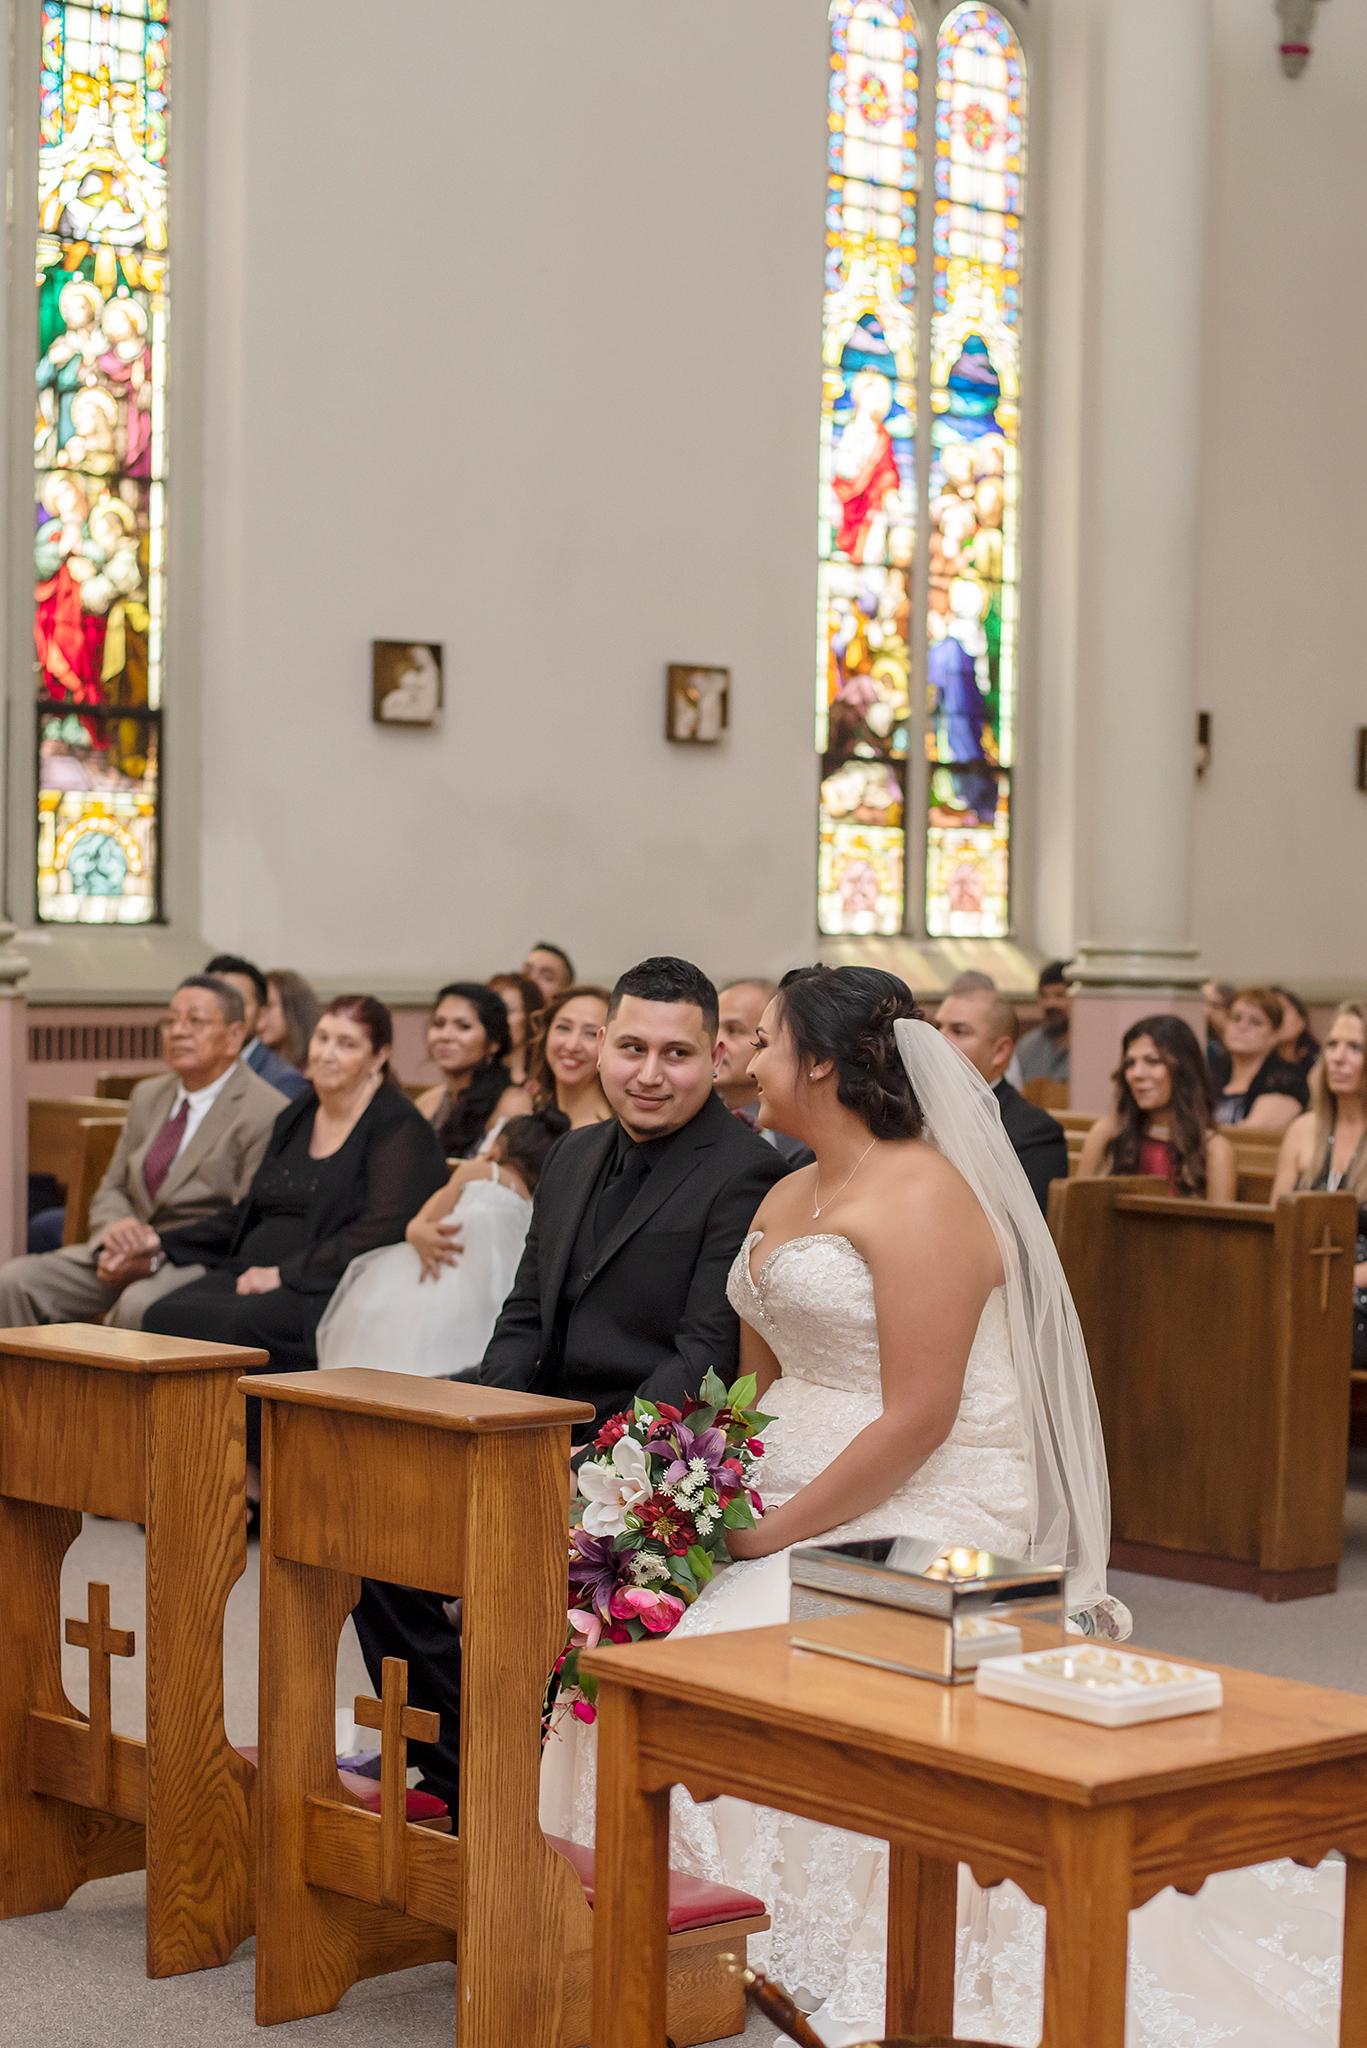 Lindsay-Adkins-Photography-Michigan-Wedding-Photographer-BernalBlog-3